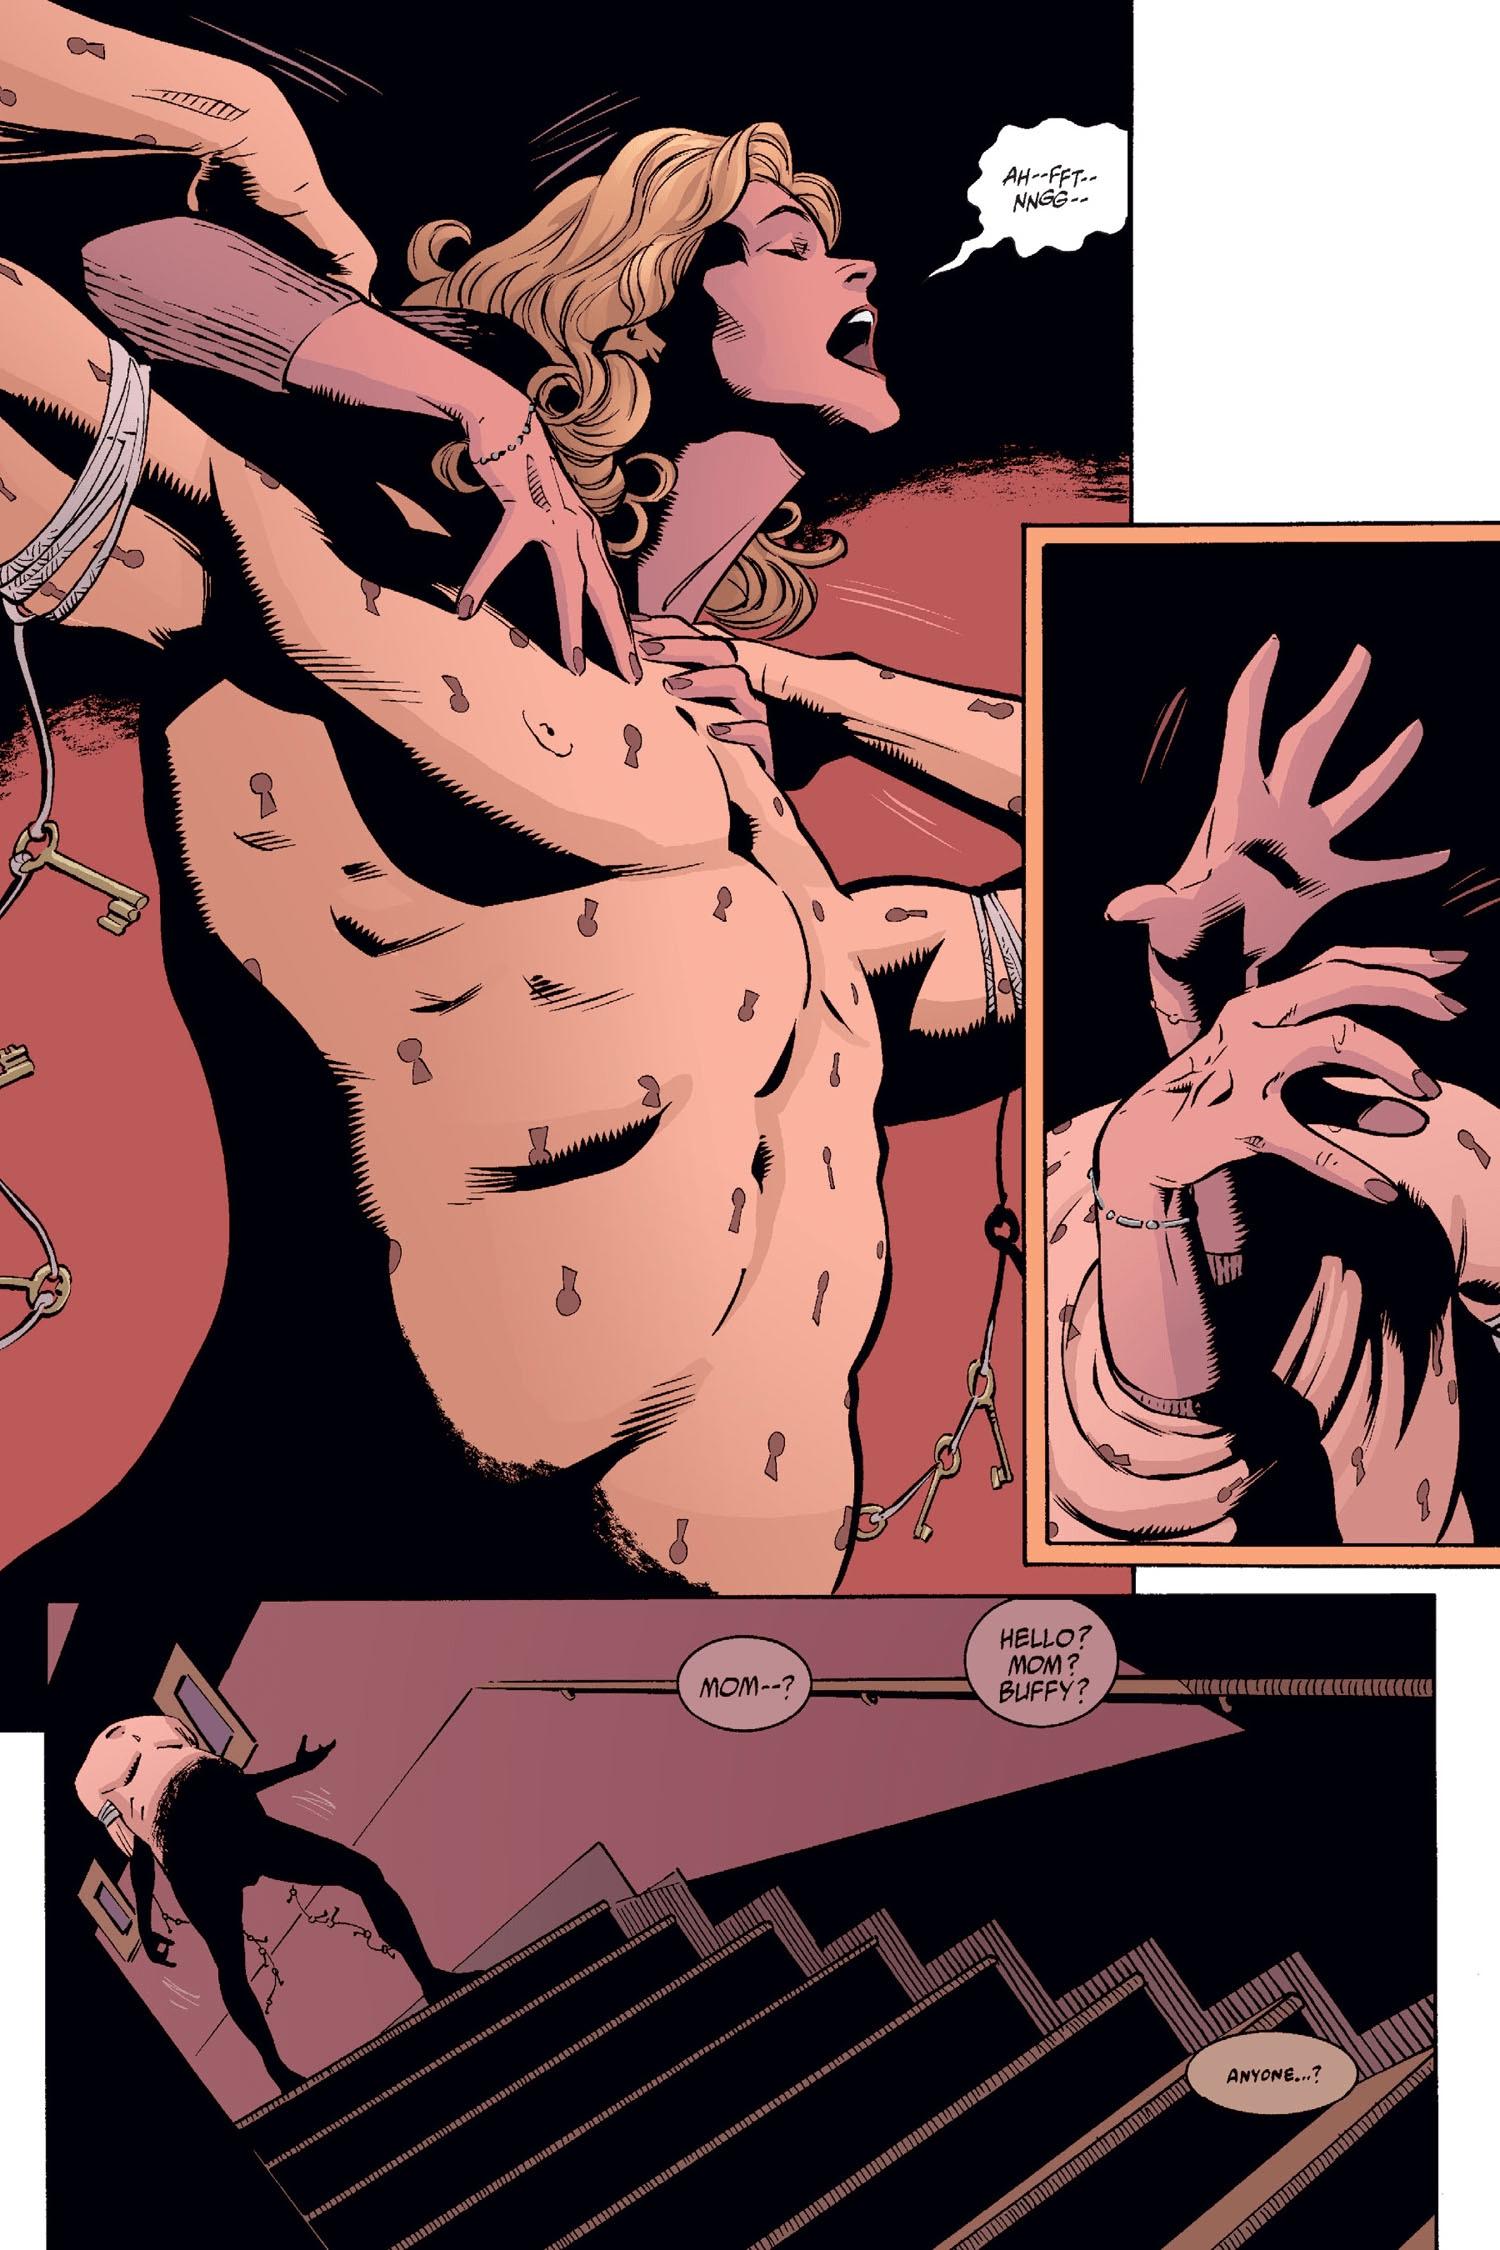 Read online Buffy the Vampire Slayer: Omnibus comic -  Issue # TPB 2 - 58